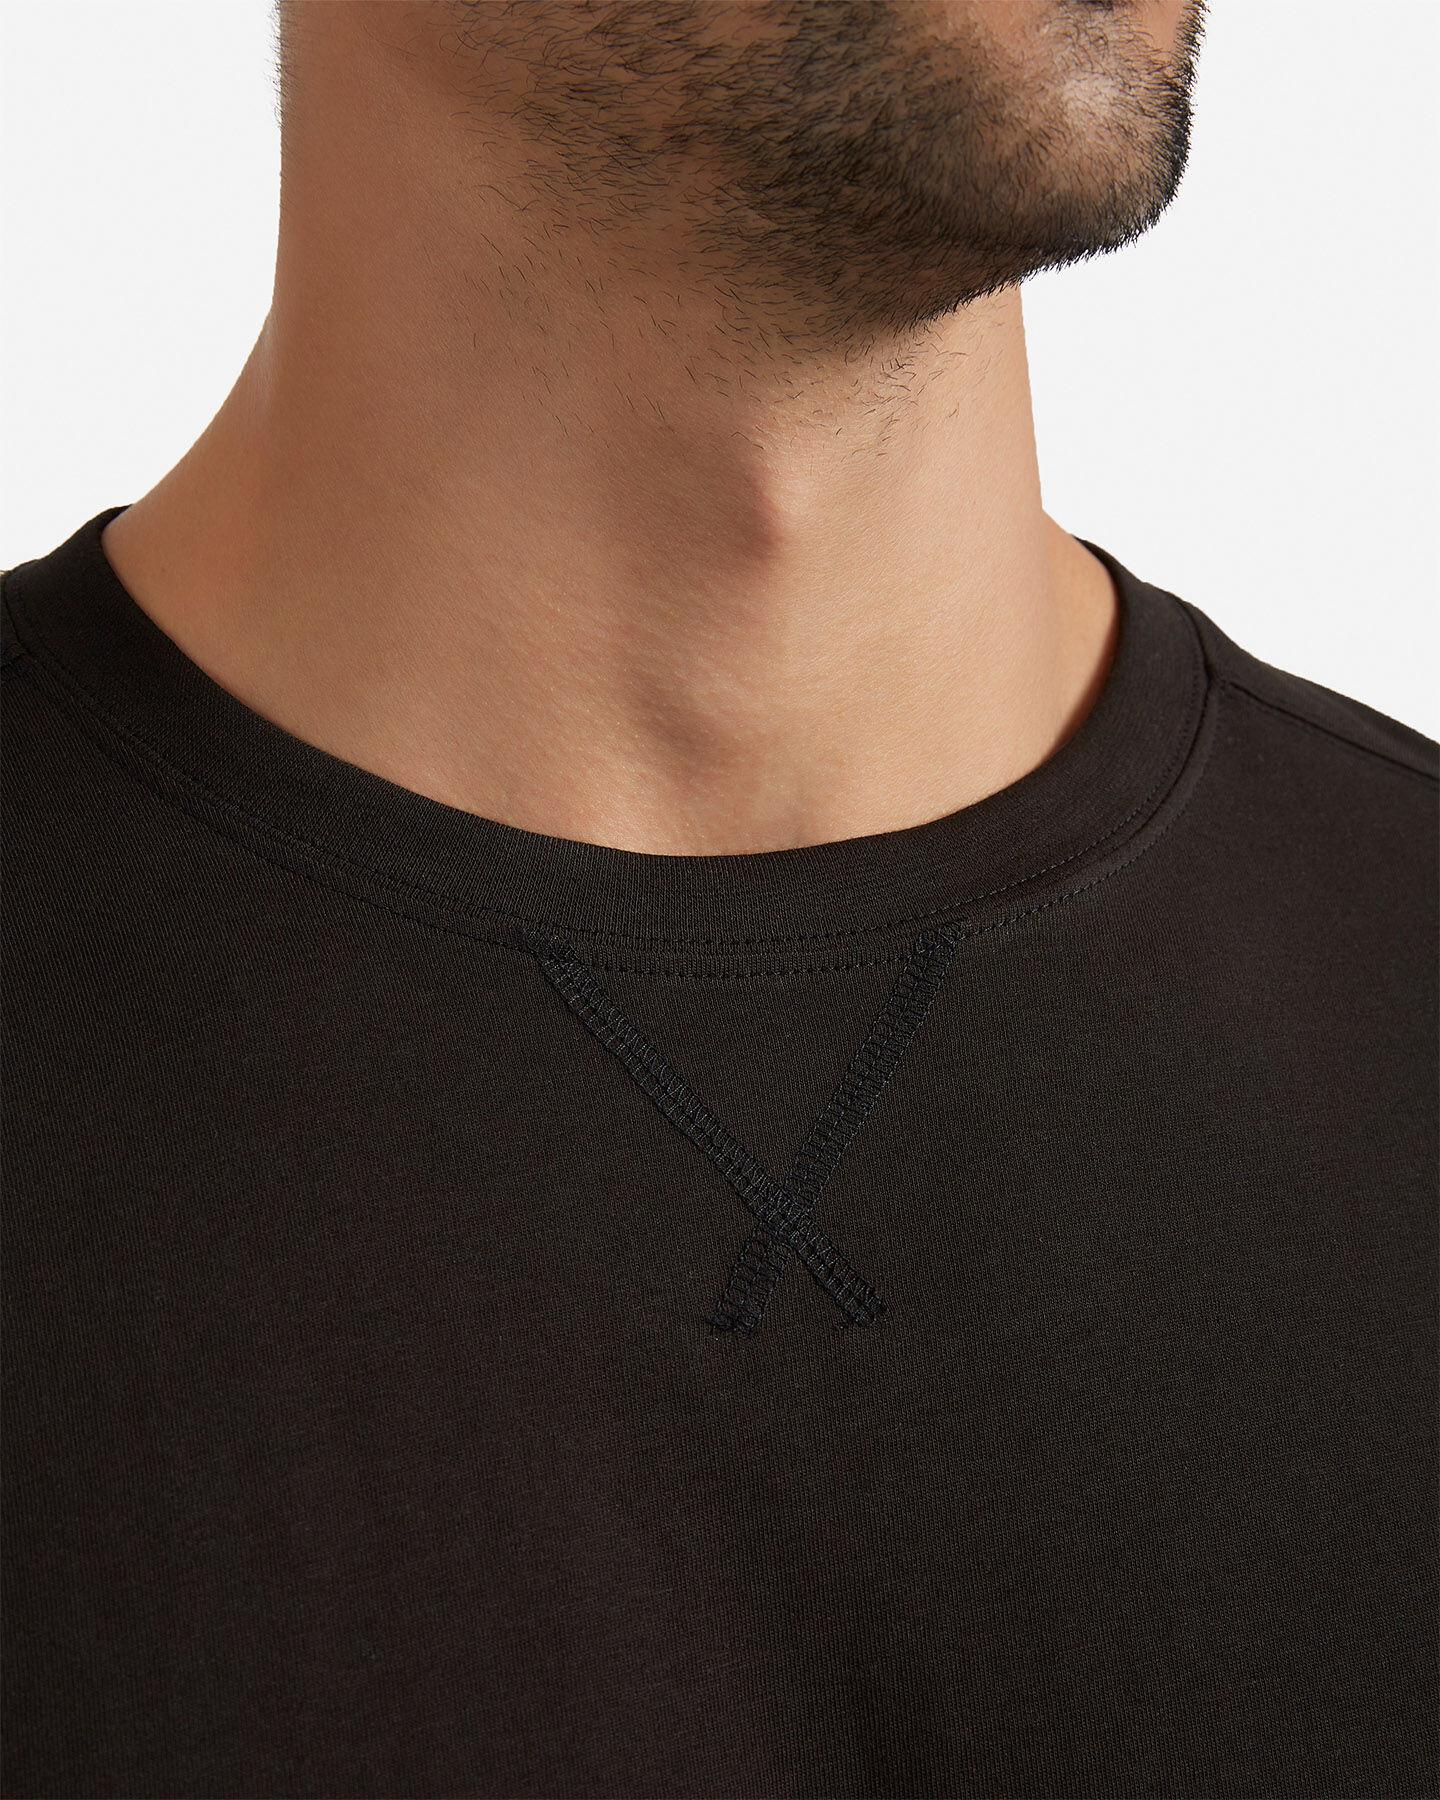 T-Shirt ABC GIROCOLLO M S4030755 scatto 4